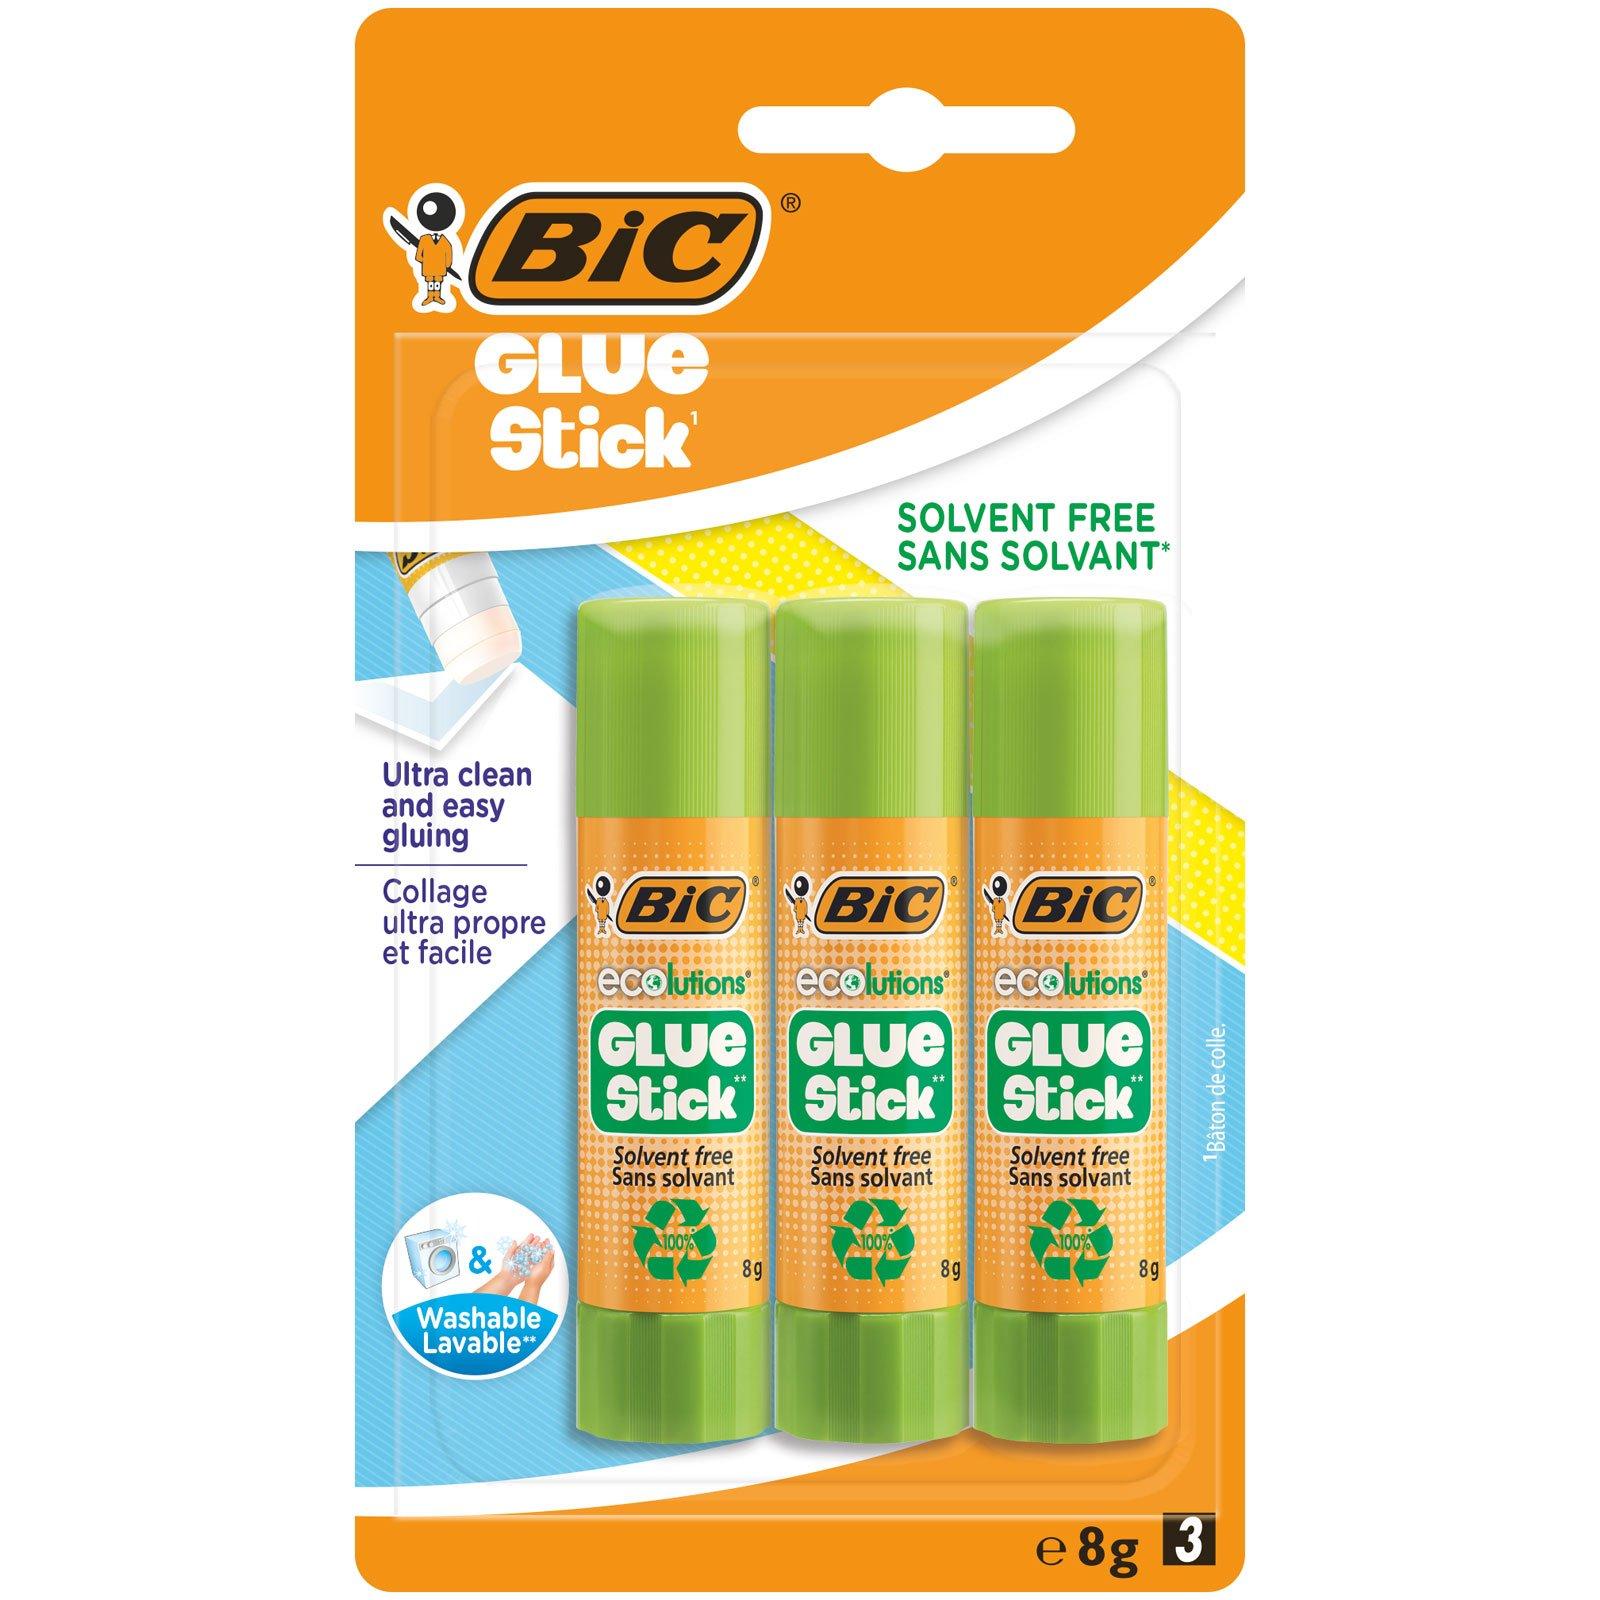 BIC 8 g, Pegamento en Barra. 3 Unidades product image